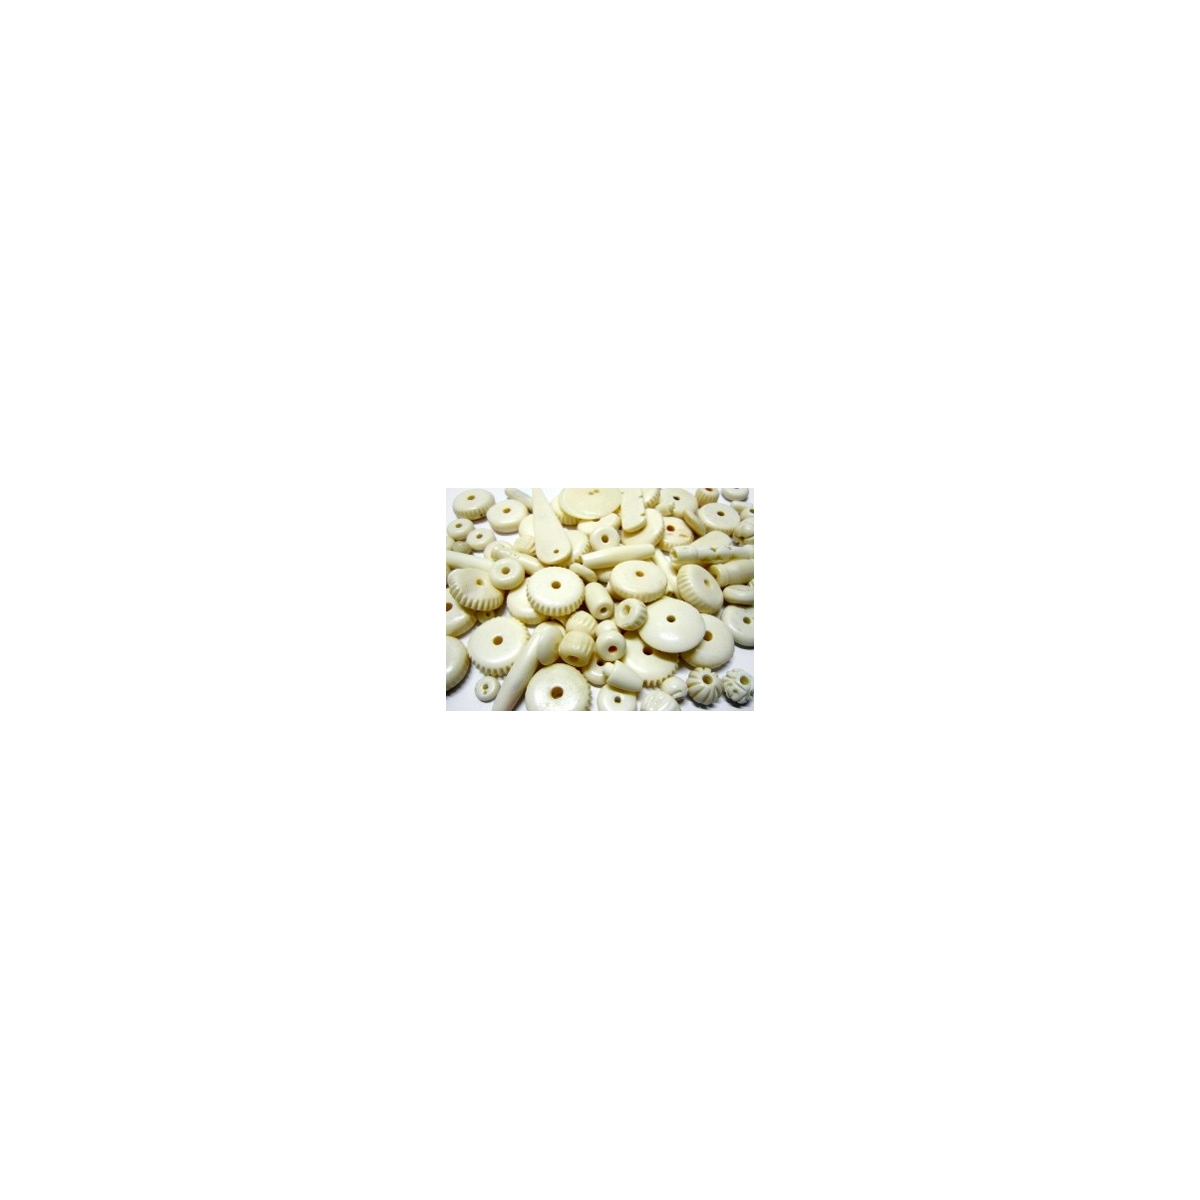 Mixture Of Bone Beads - Natural Bone